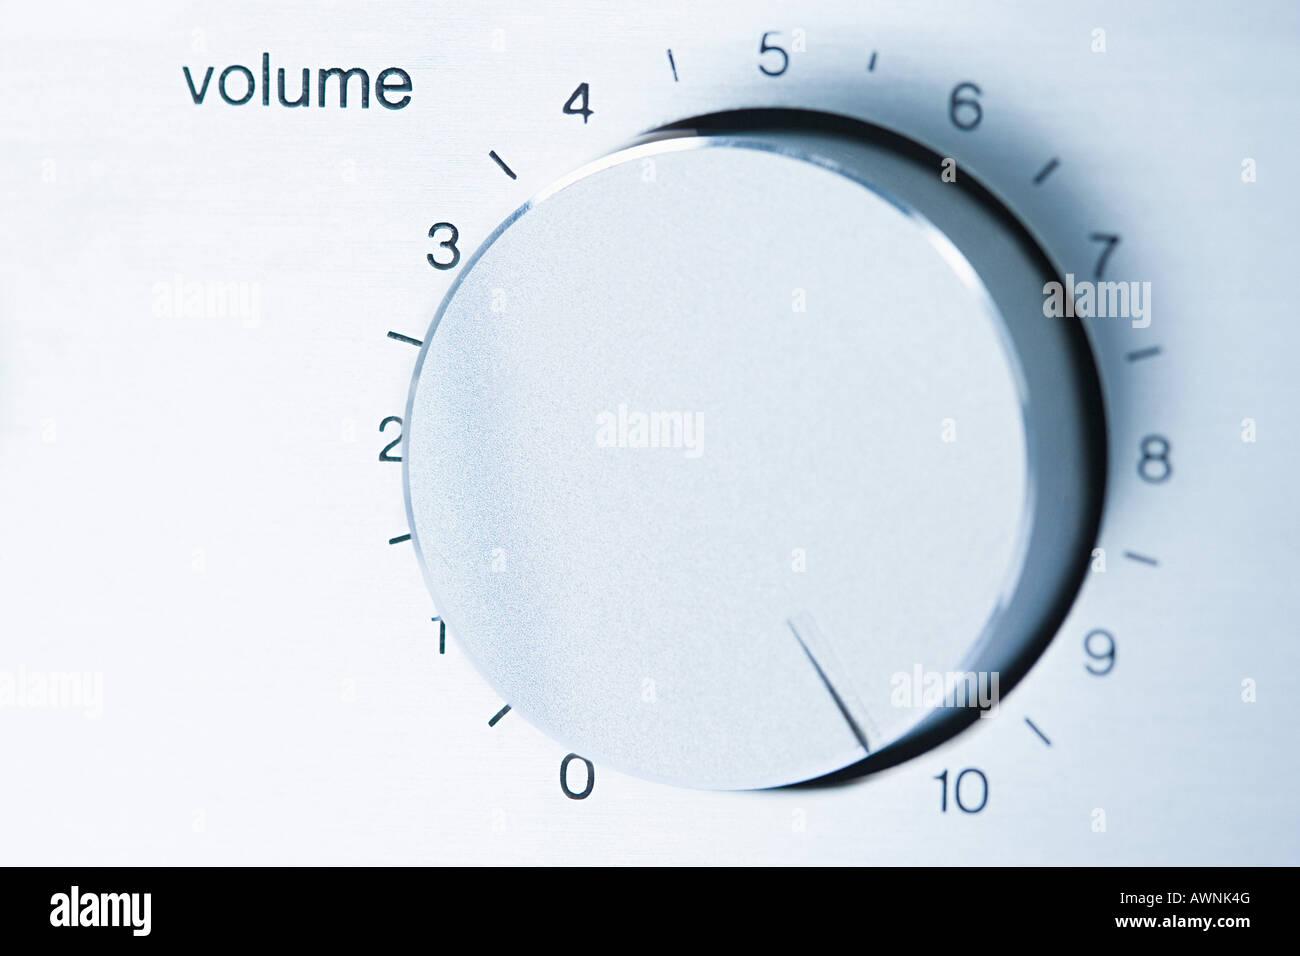 Volume knob - Stock Image